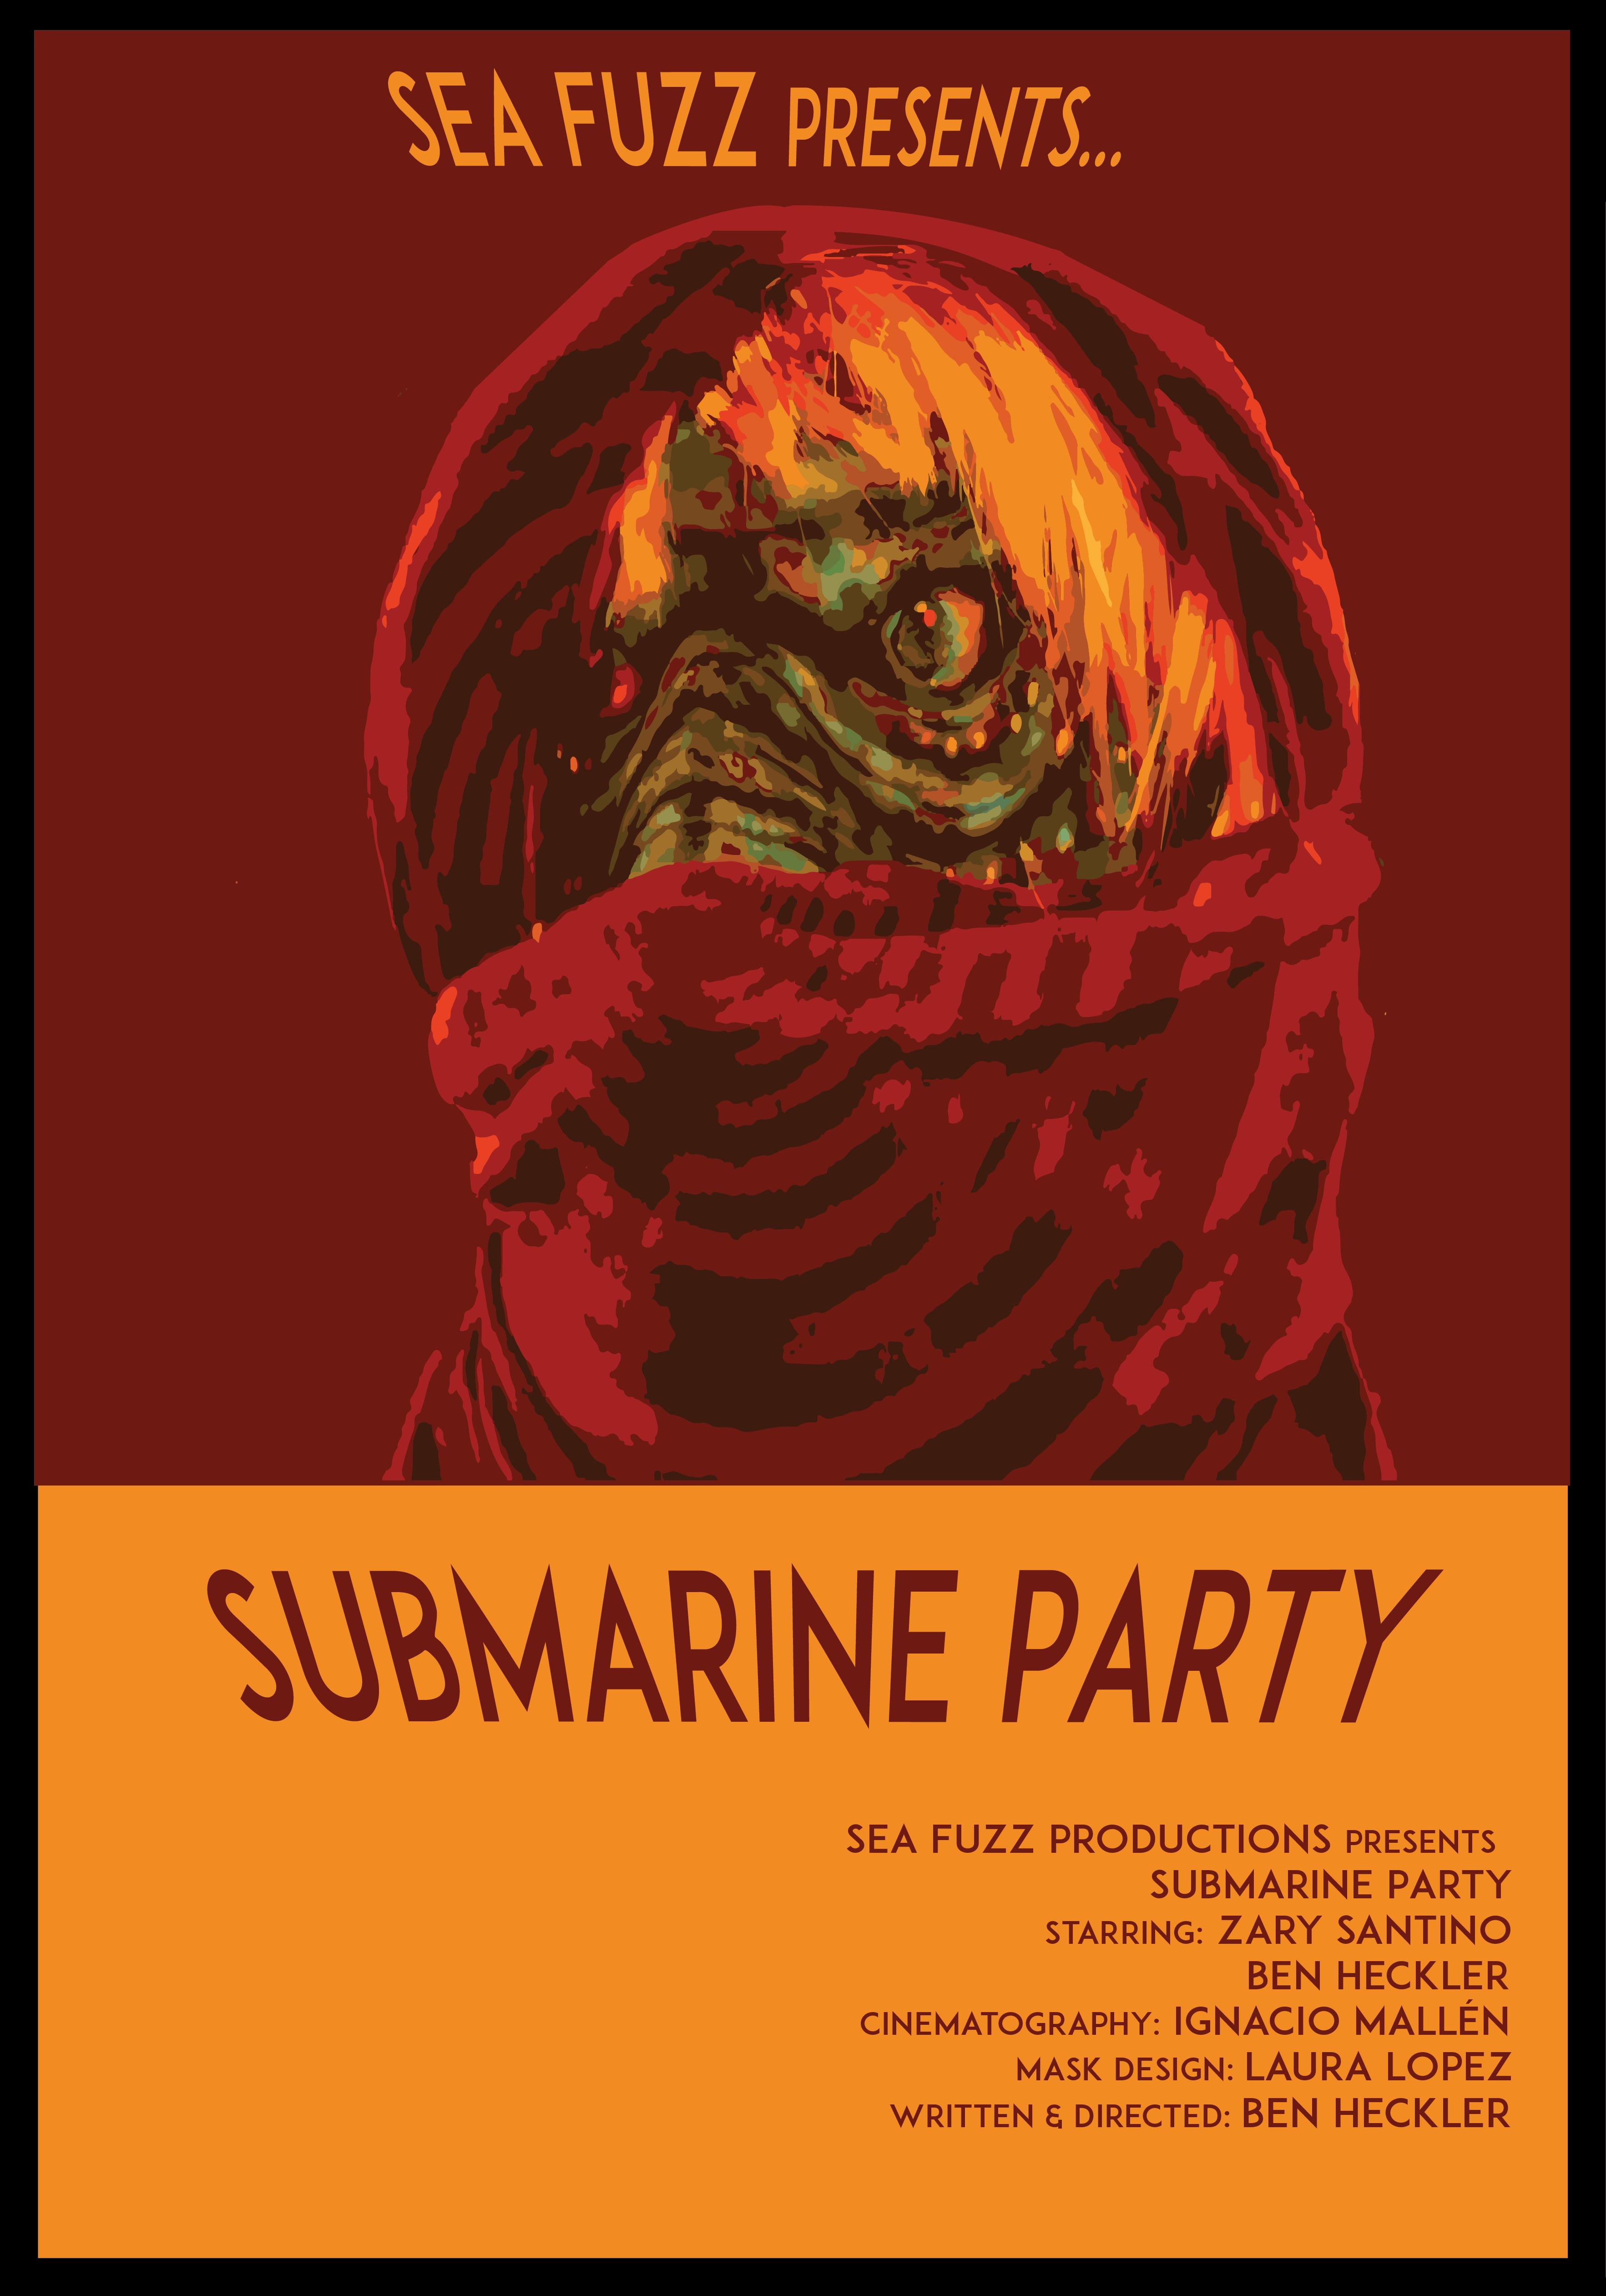 Submarine Party - Sea Fuzz